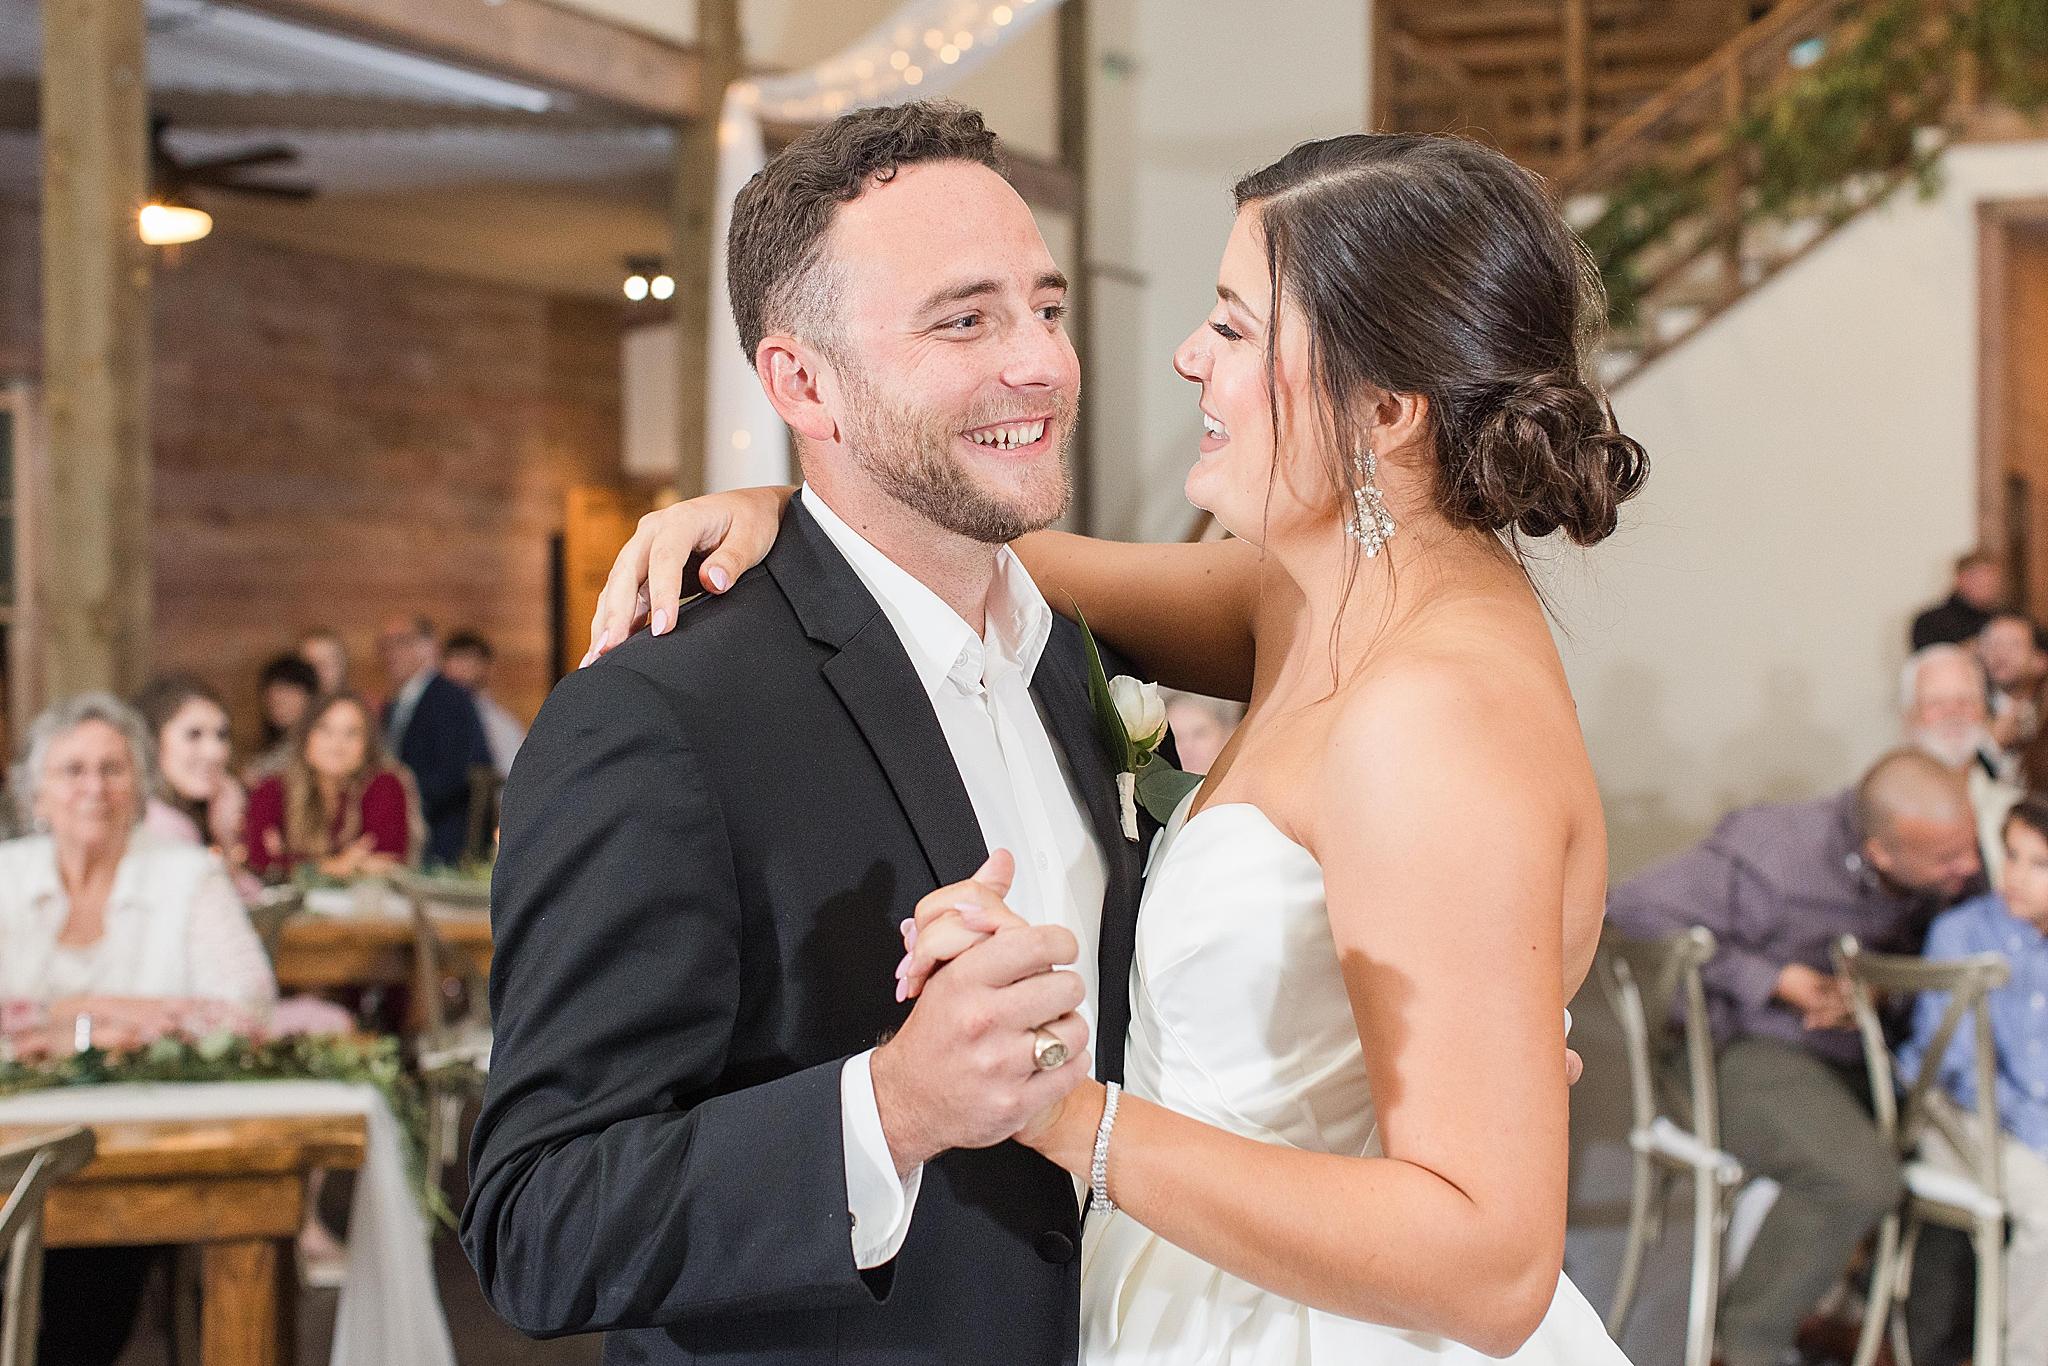 bride and groom dance during Izenstone wedding reception